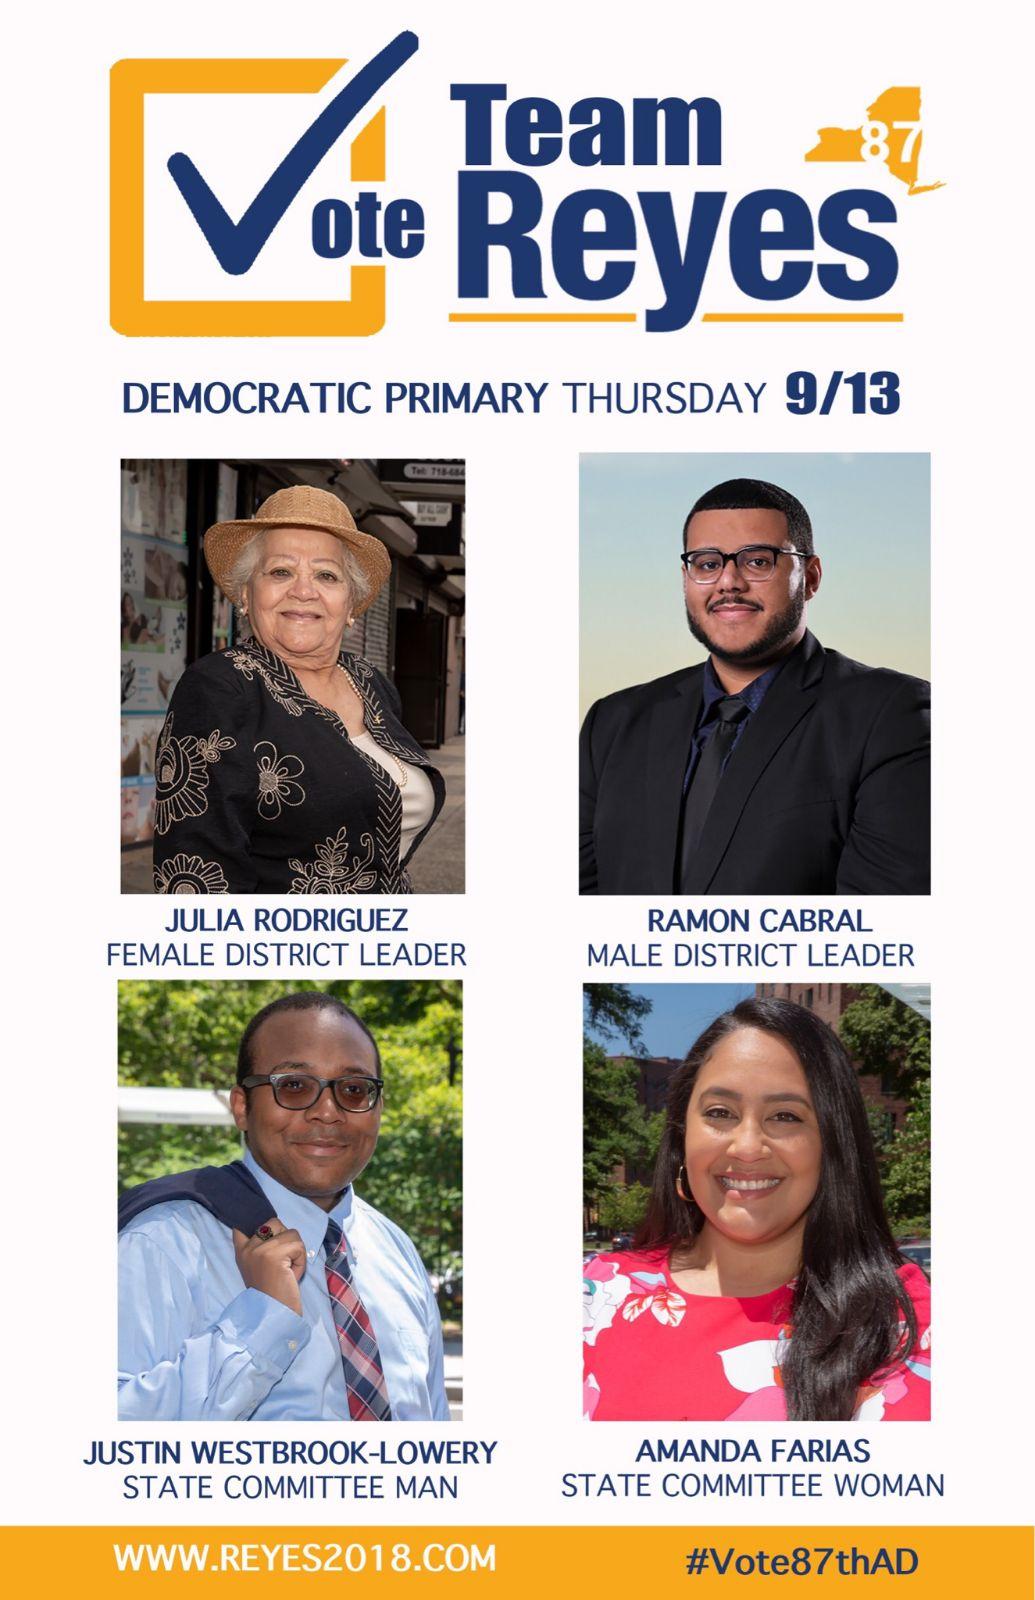 Sep 13, Vota